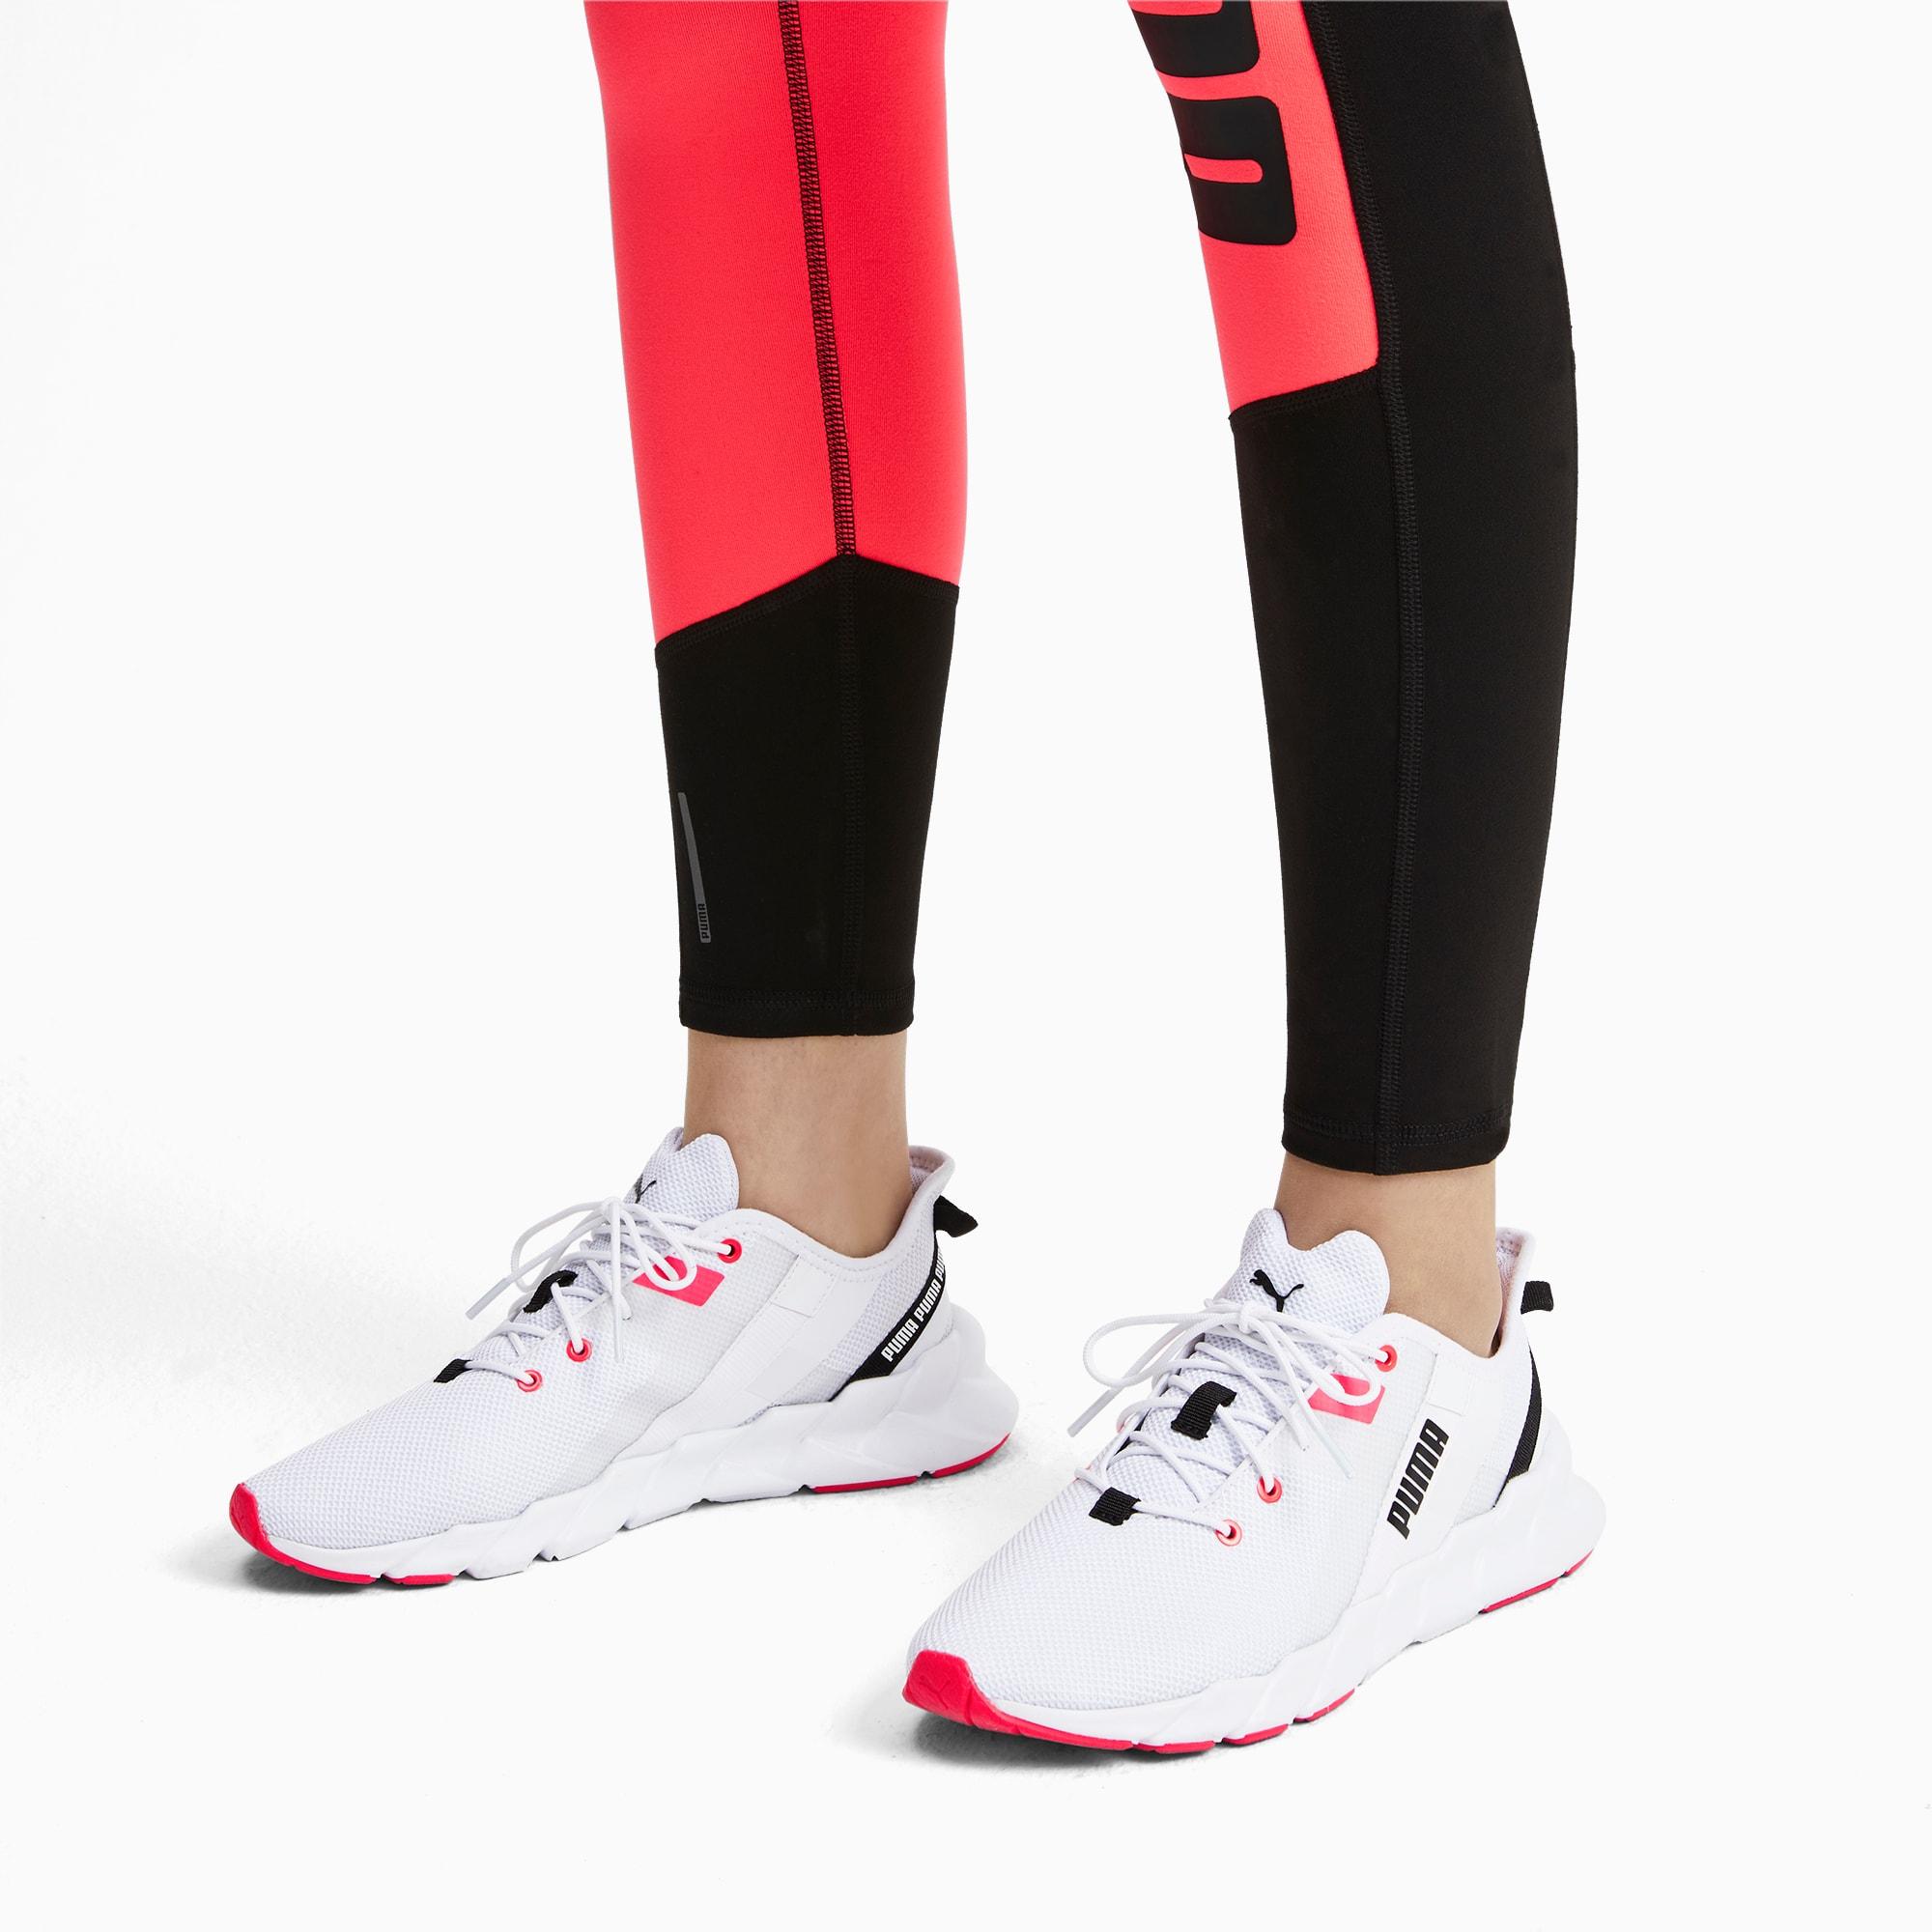 zapatillas de running de mujer weave xt puma